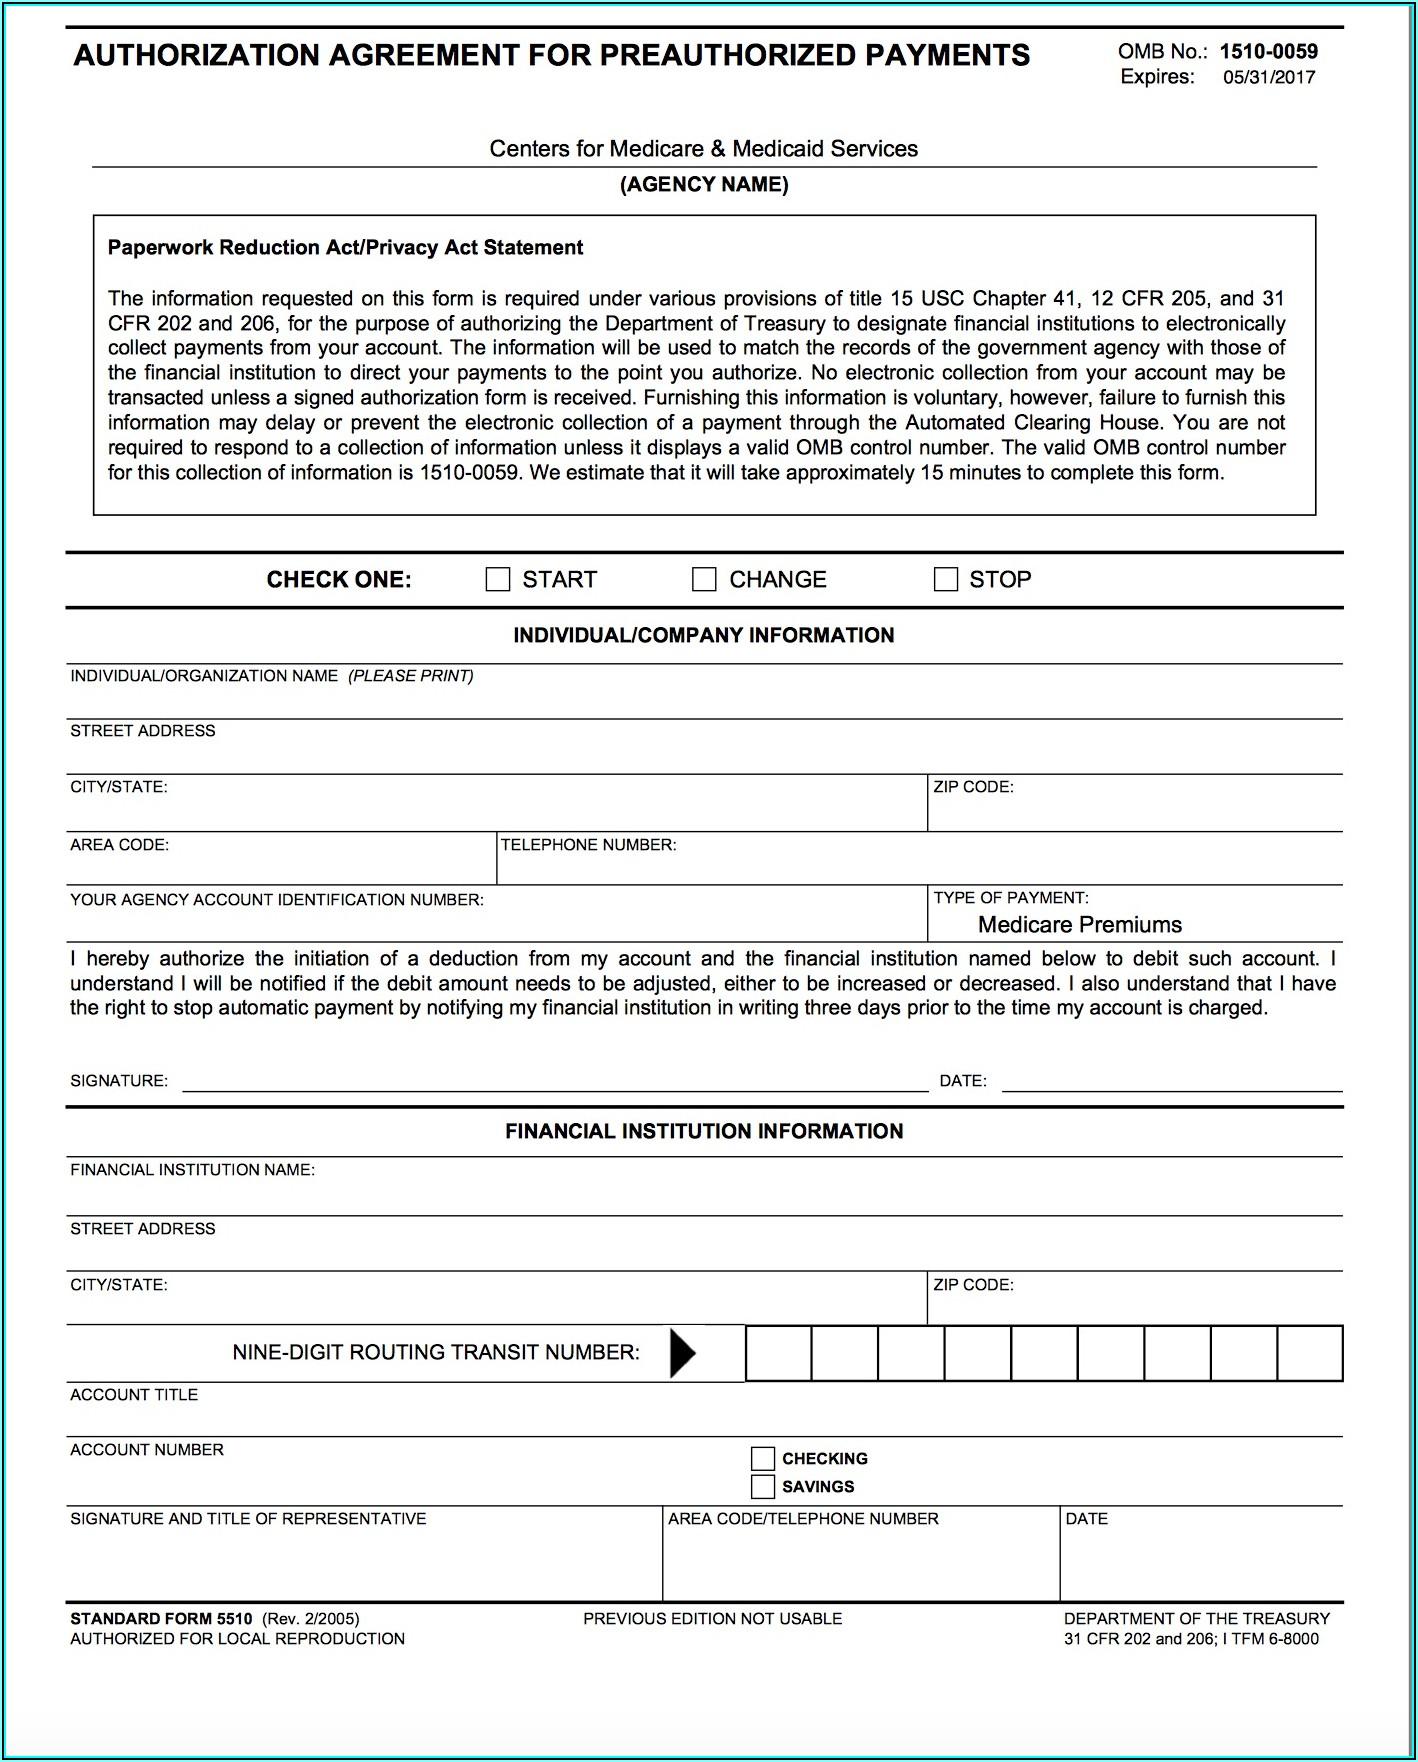 Medicare Form 5510 Signature And Title Of Representative